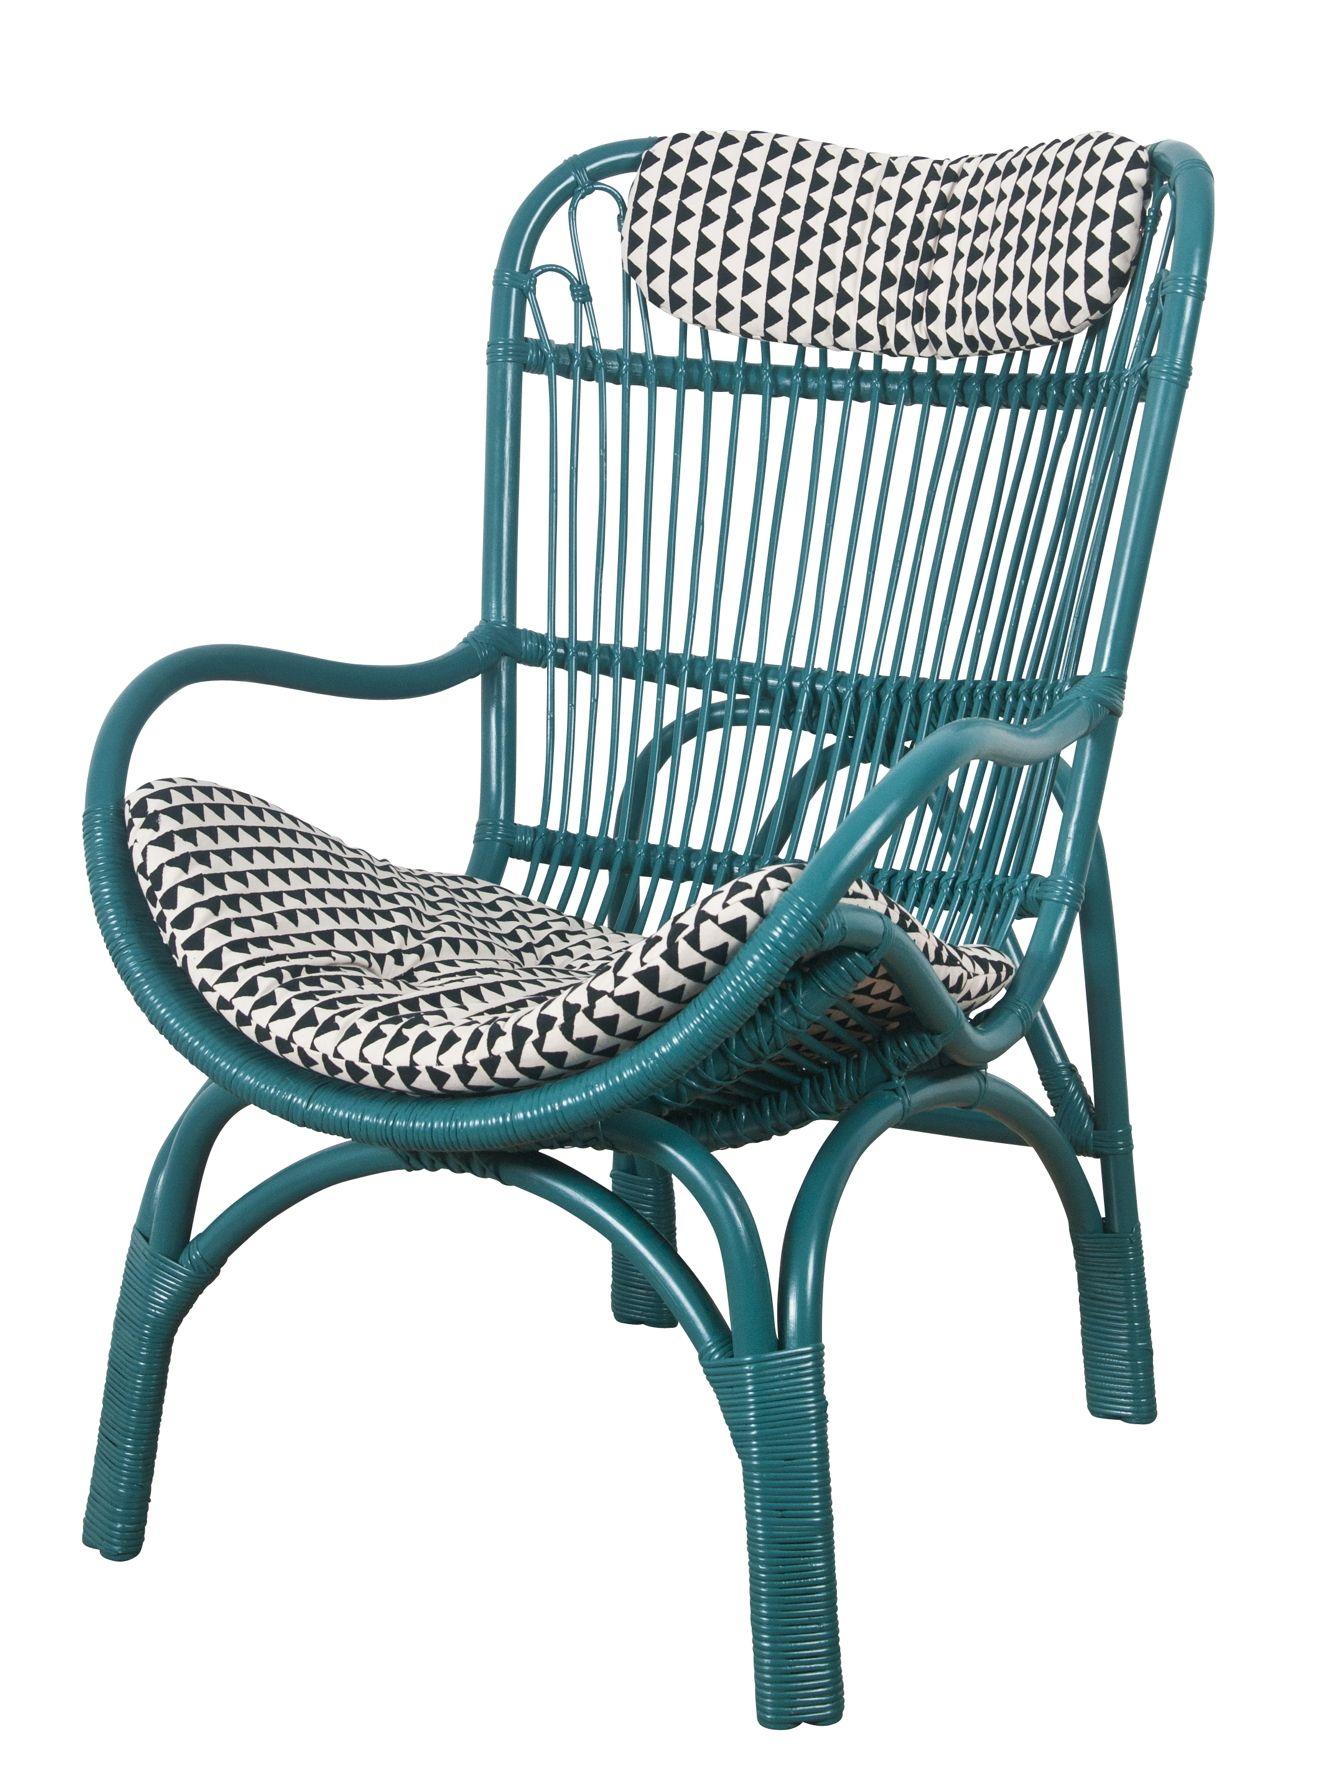 LeMondeSauvage fauteuil Hawa¯ rotin peint et verni Le Monde